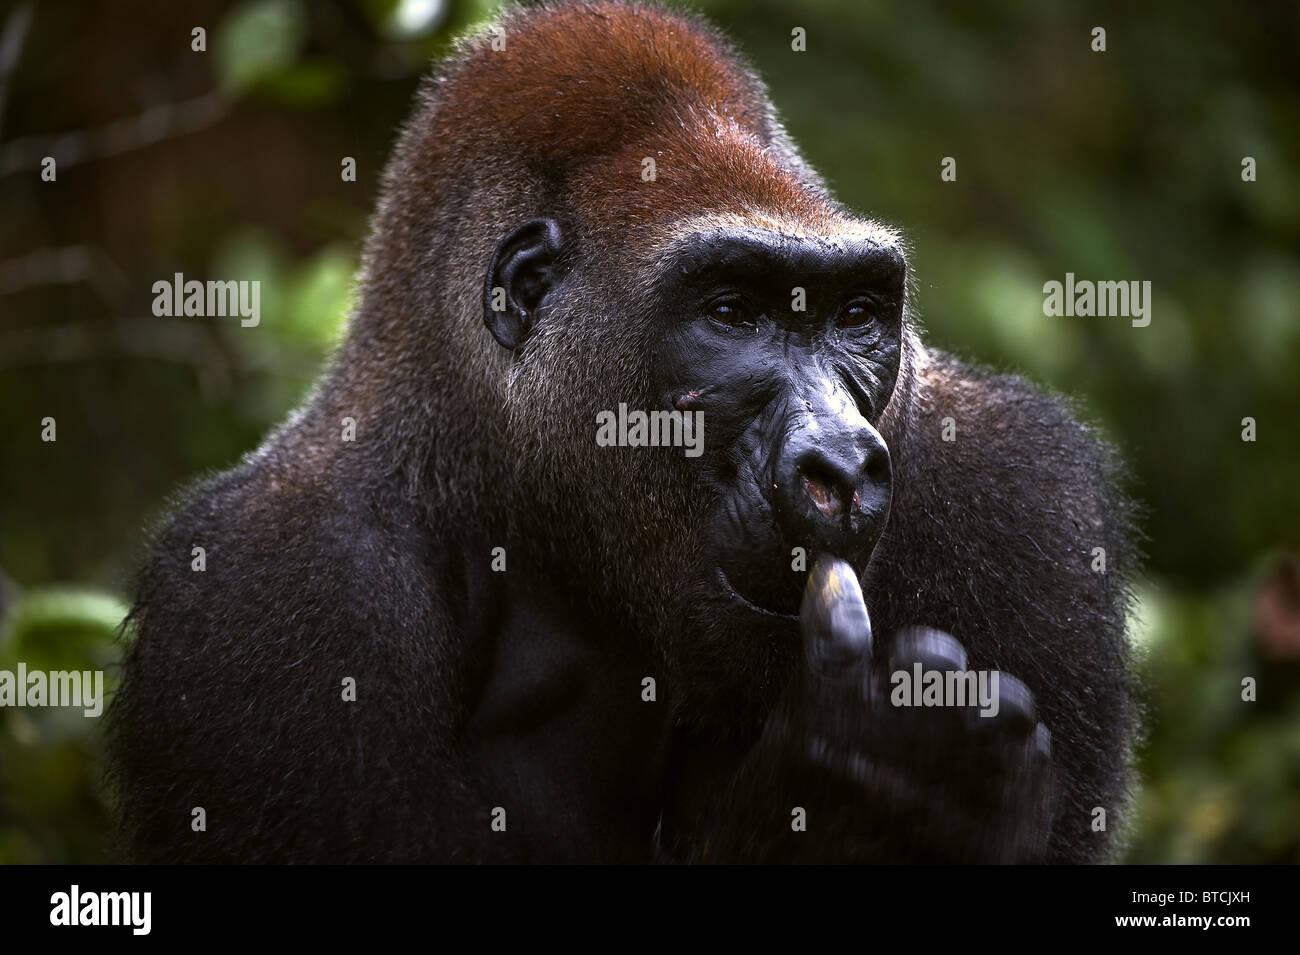 The male of a gorilla picks in a nose. A native habitat - Stock Image